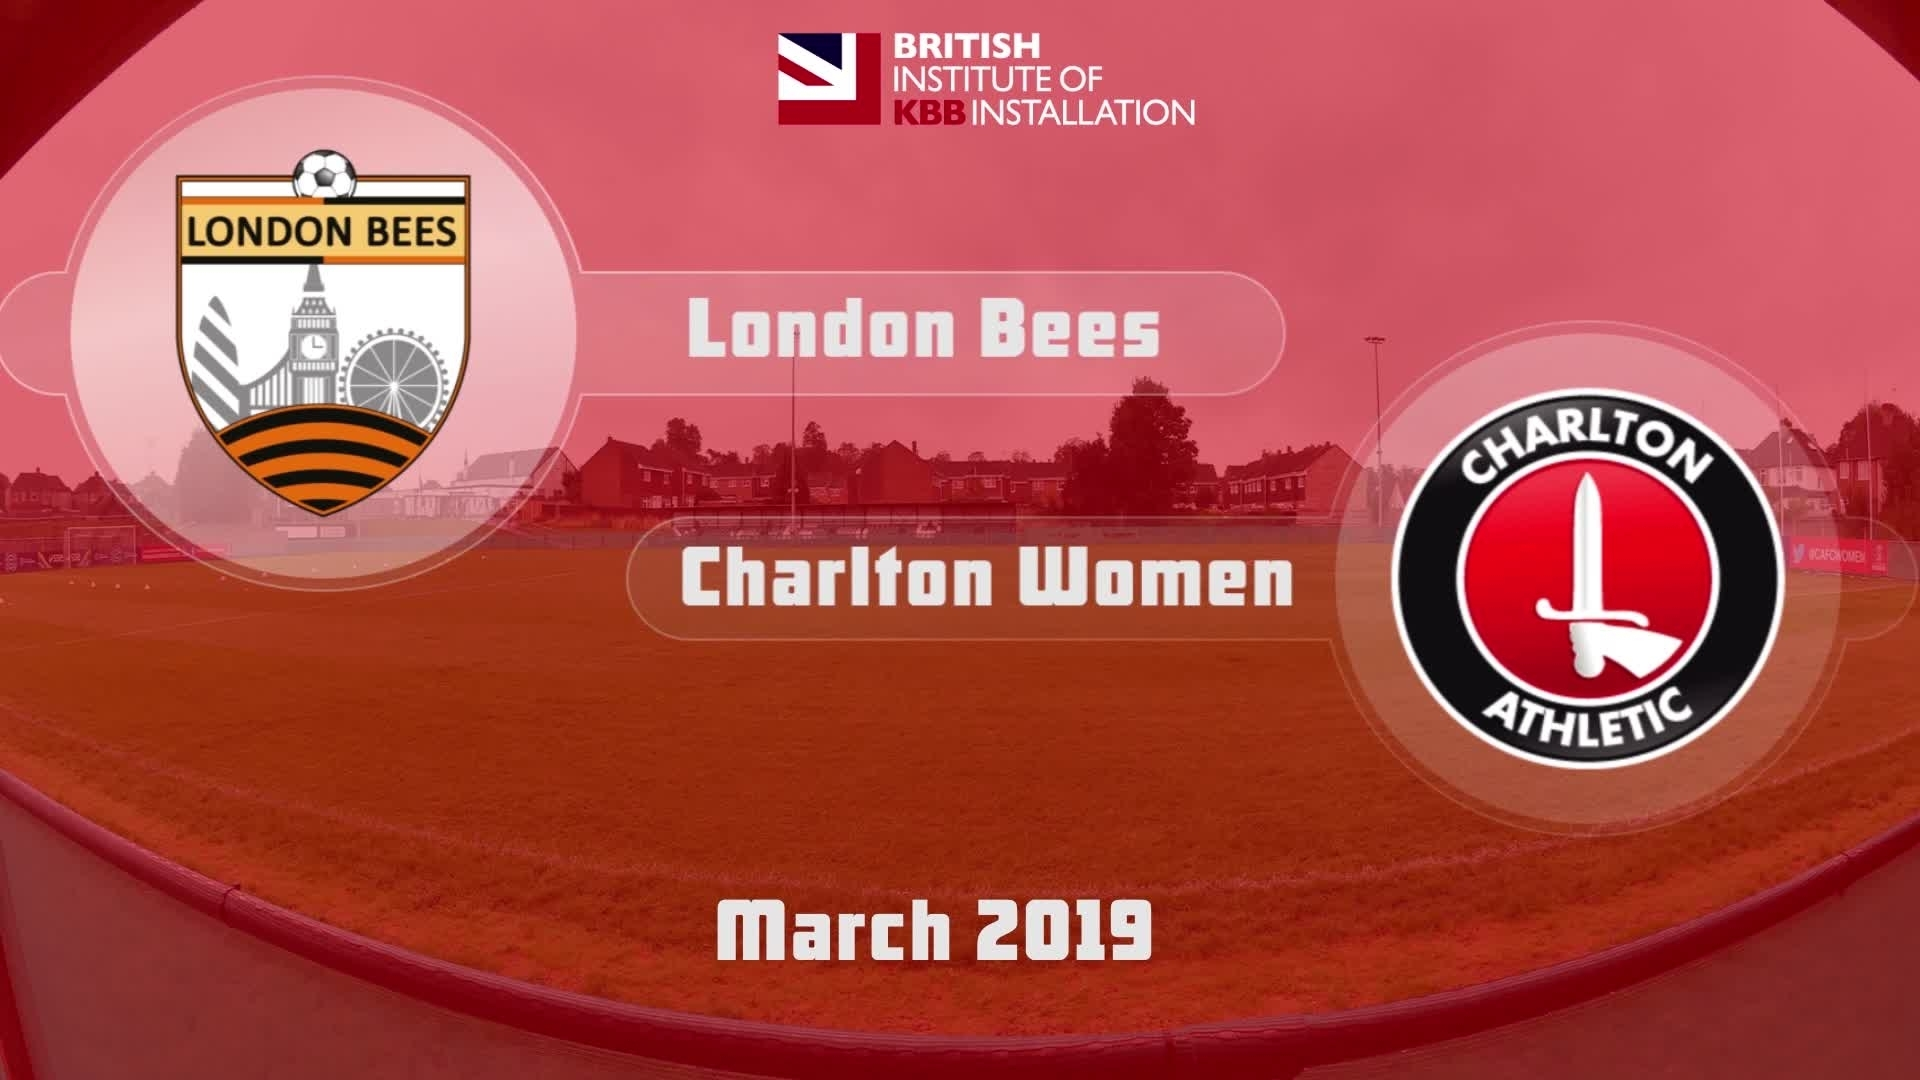 WOMEN'S HIGHLIGHTS | London Bees 1 Charlton Women 2 (March 2019)